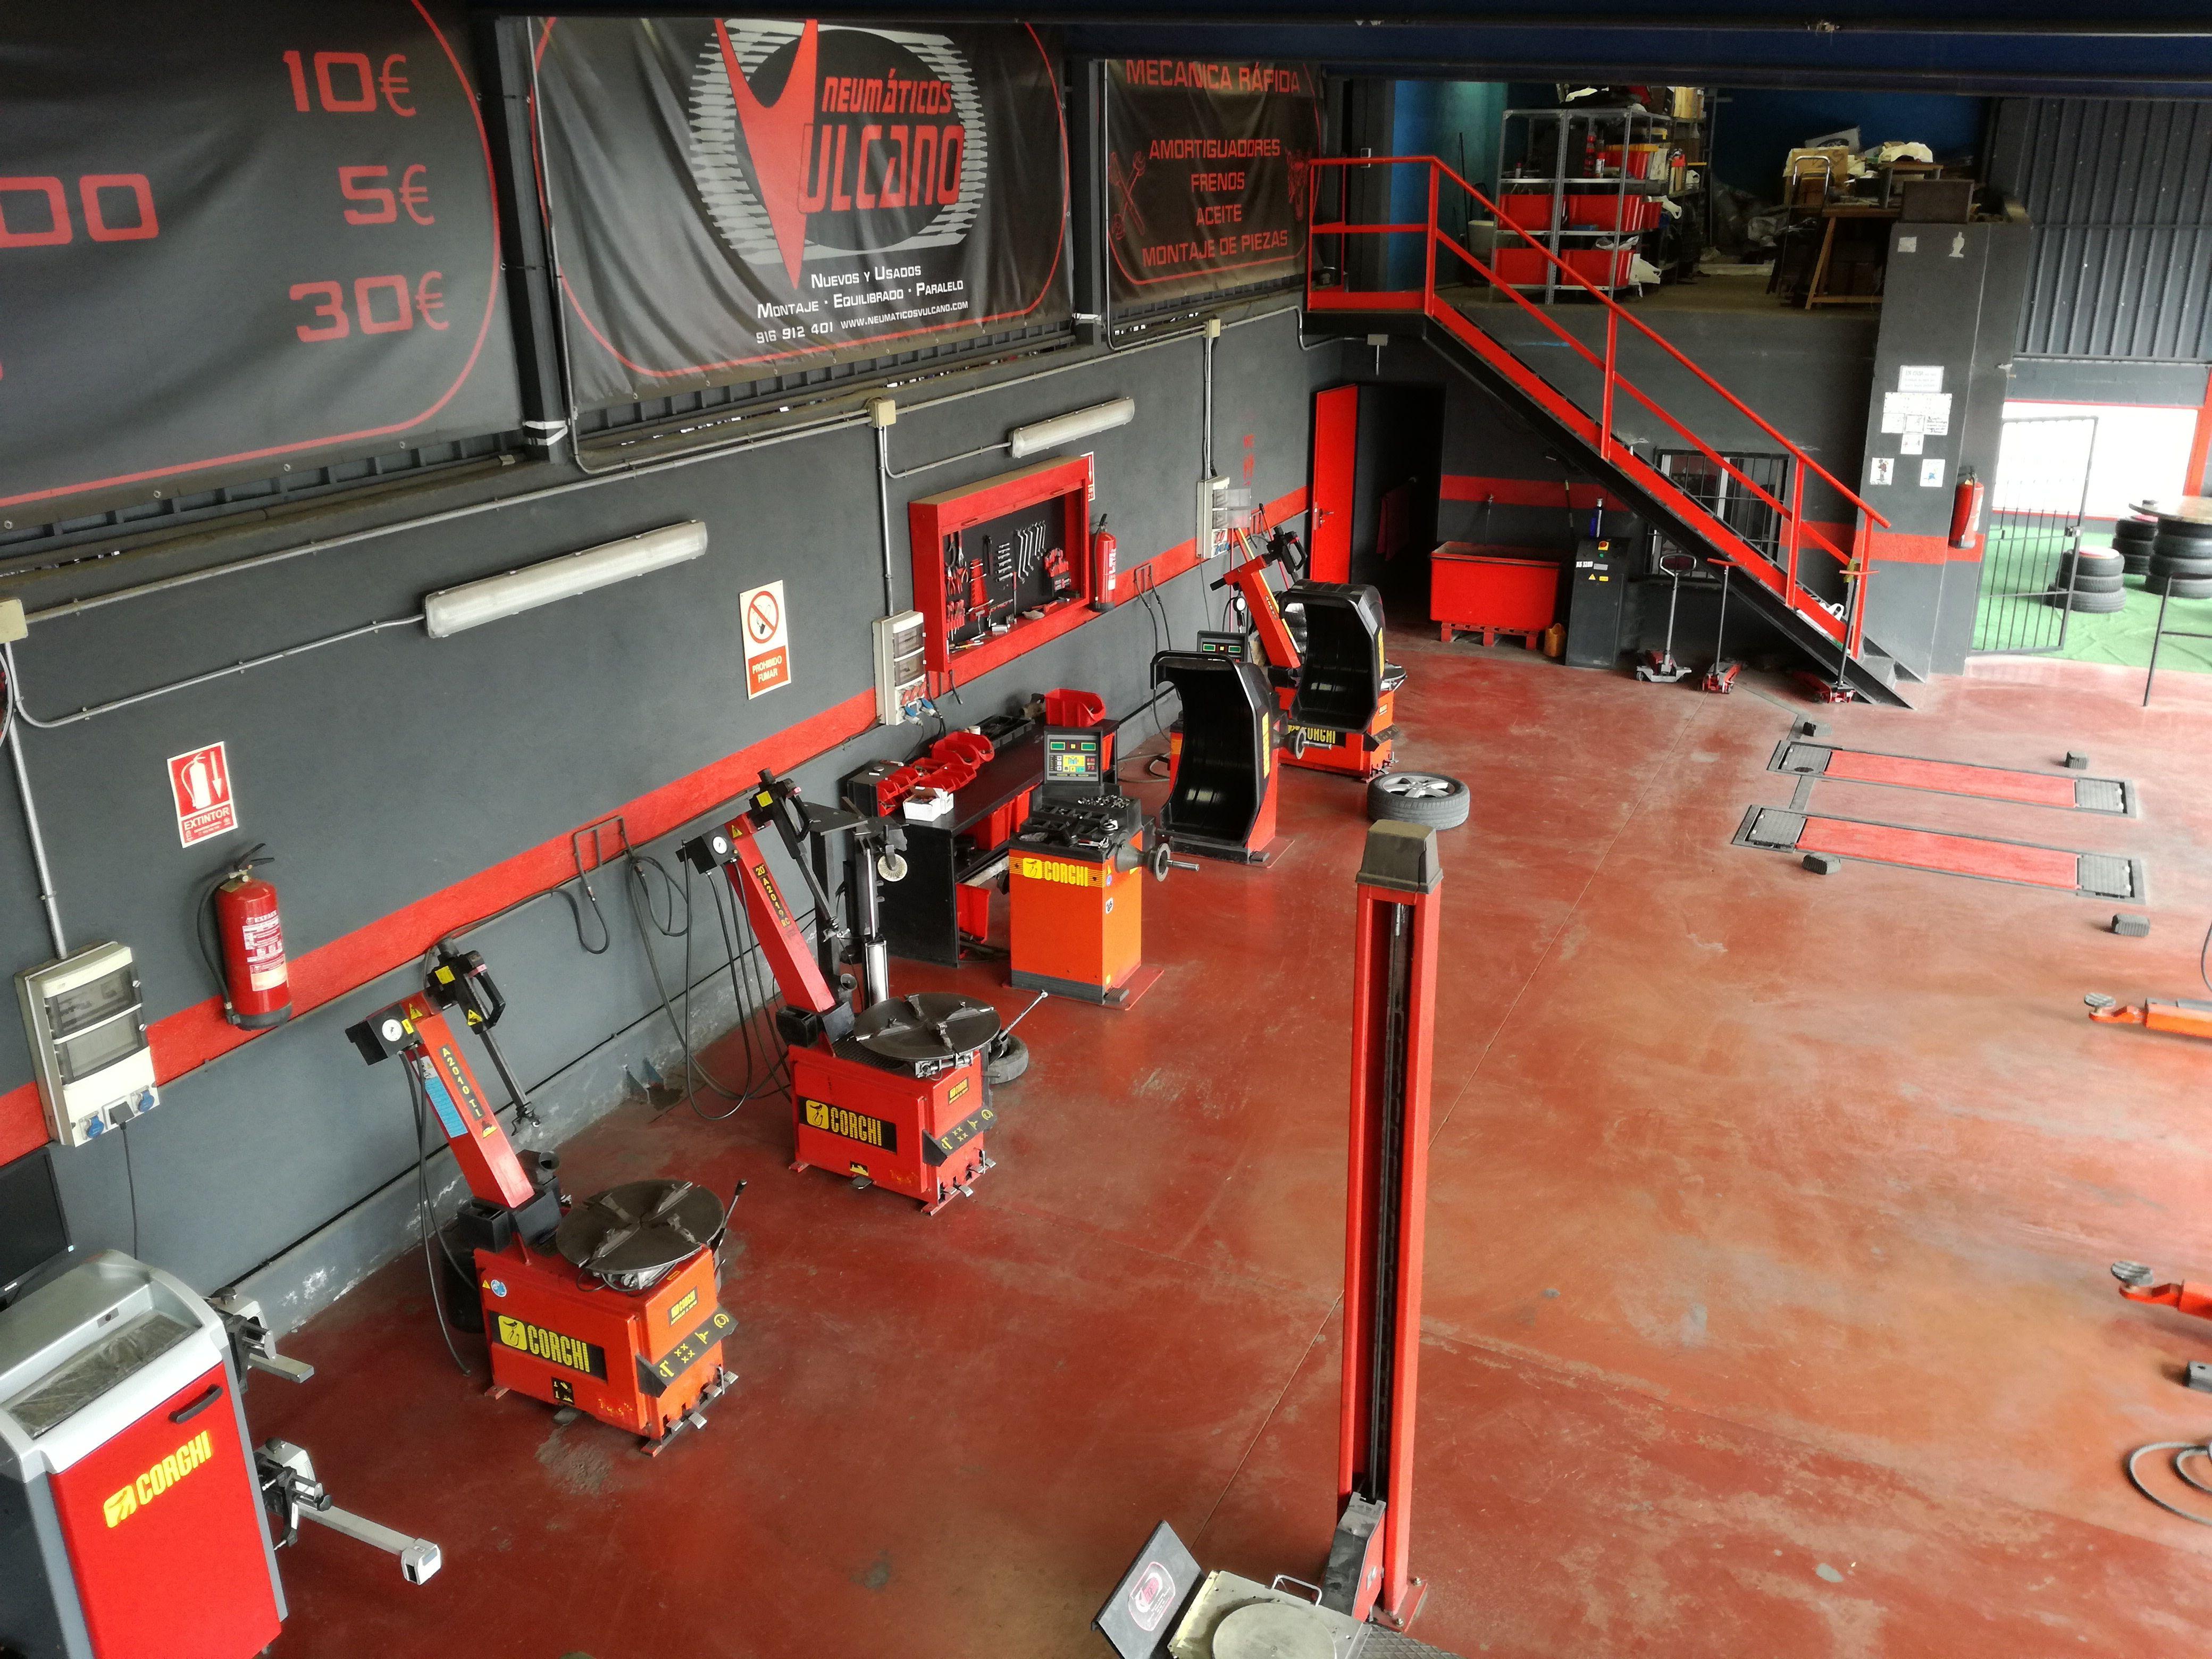 Venta de neumáticos: Servicios de Neumáticos Vulcano